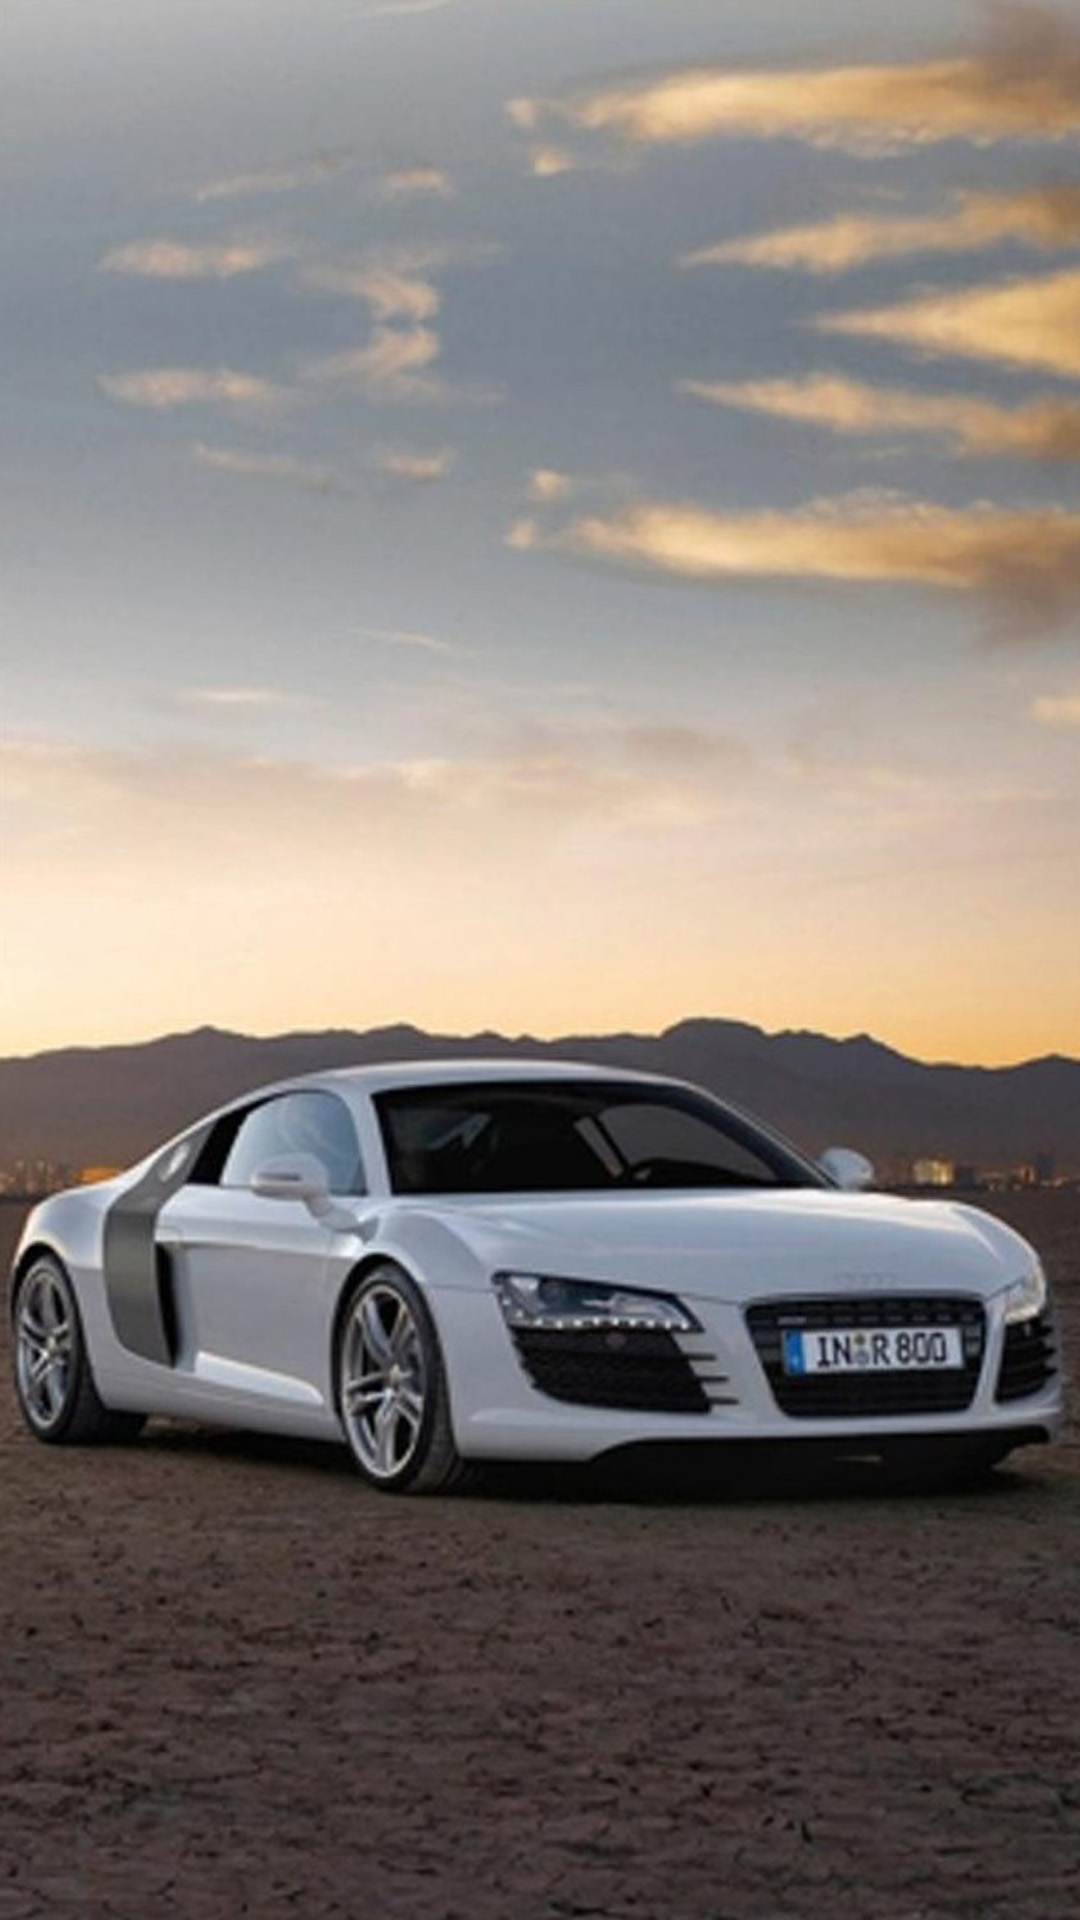 Audi R8 Sunset